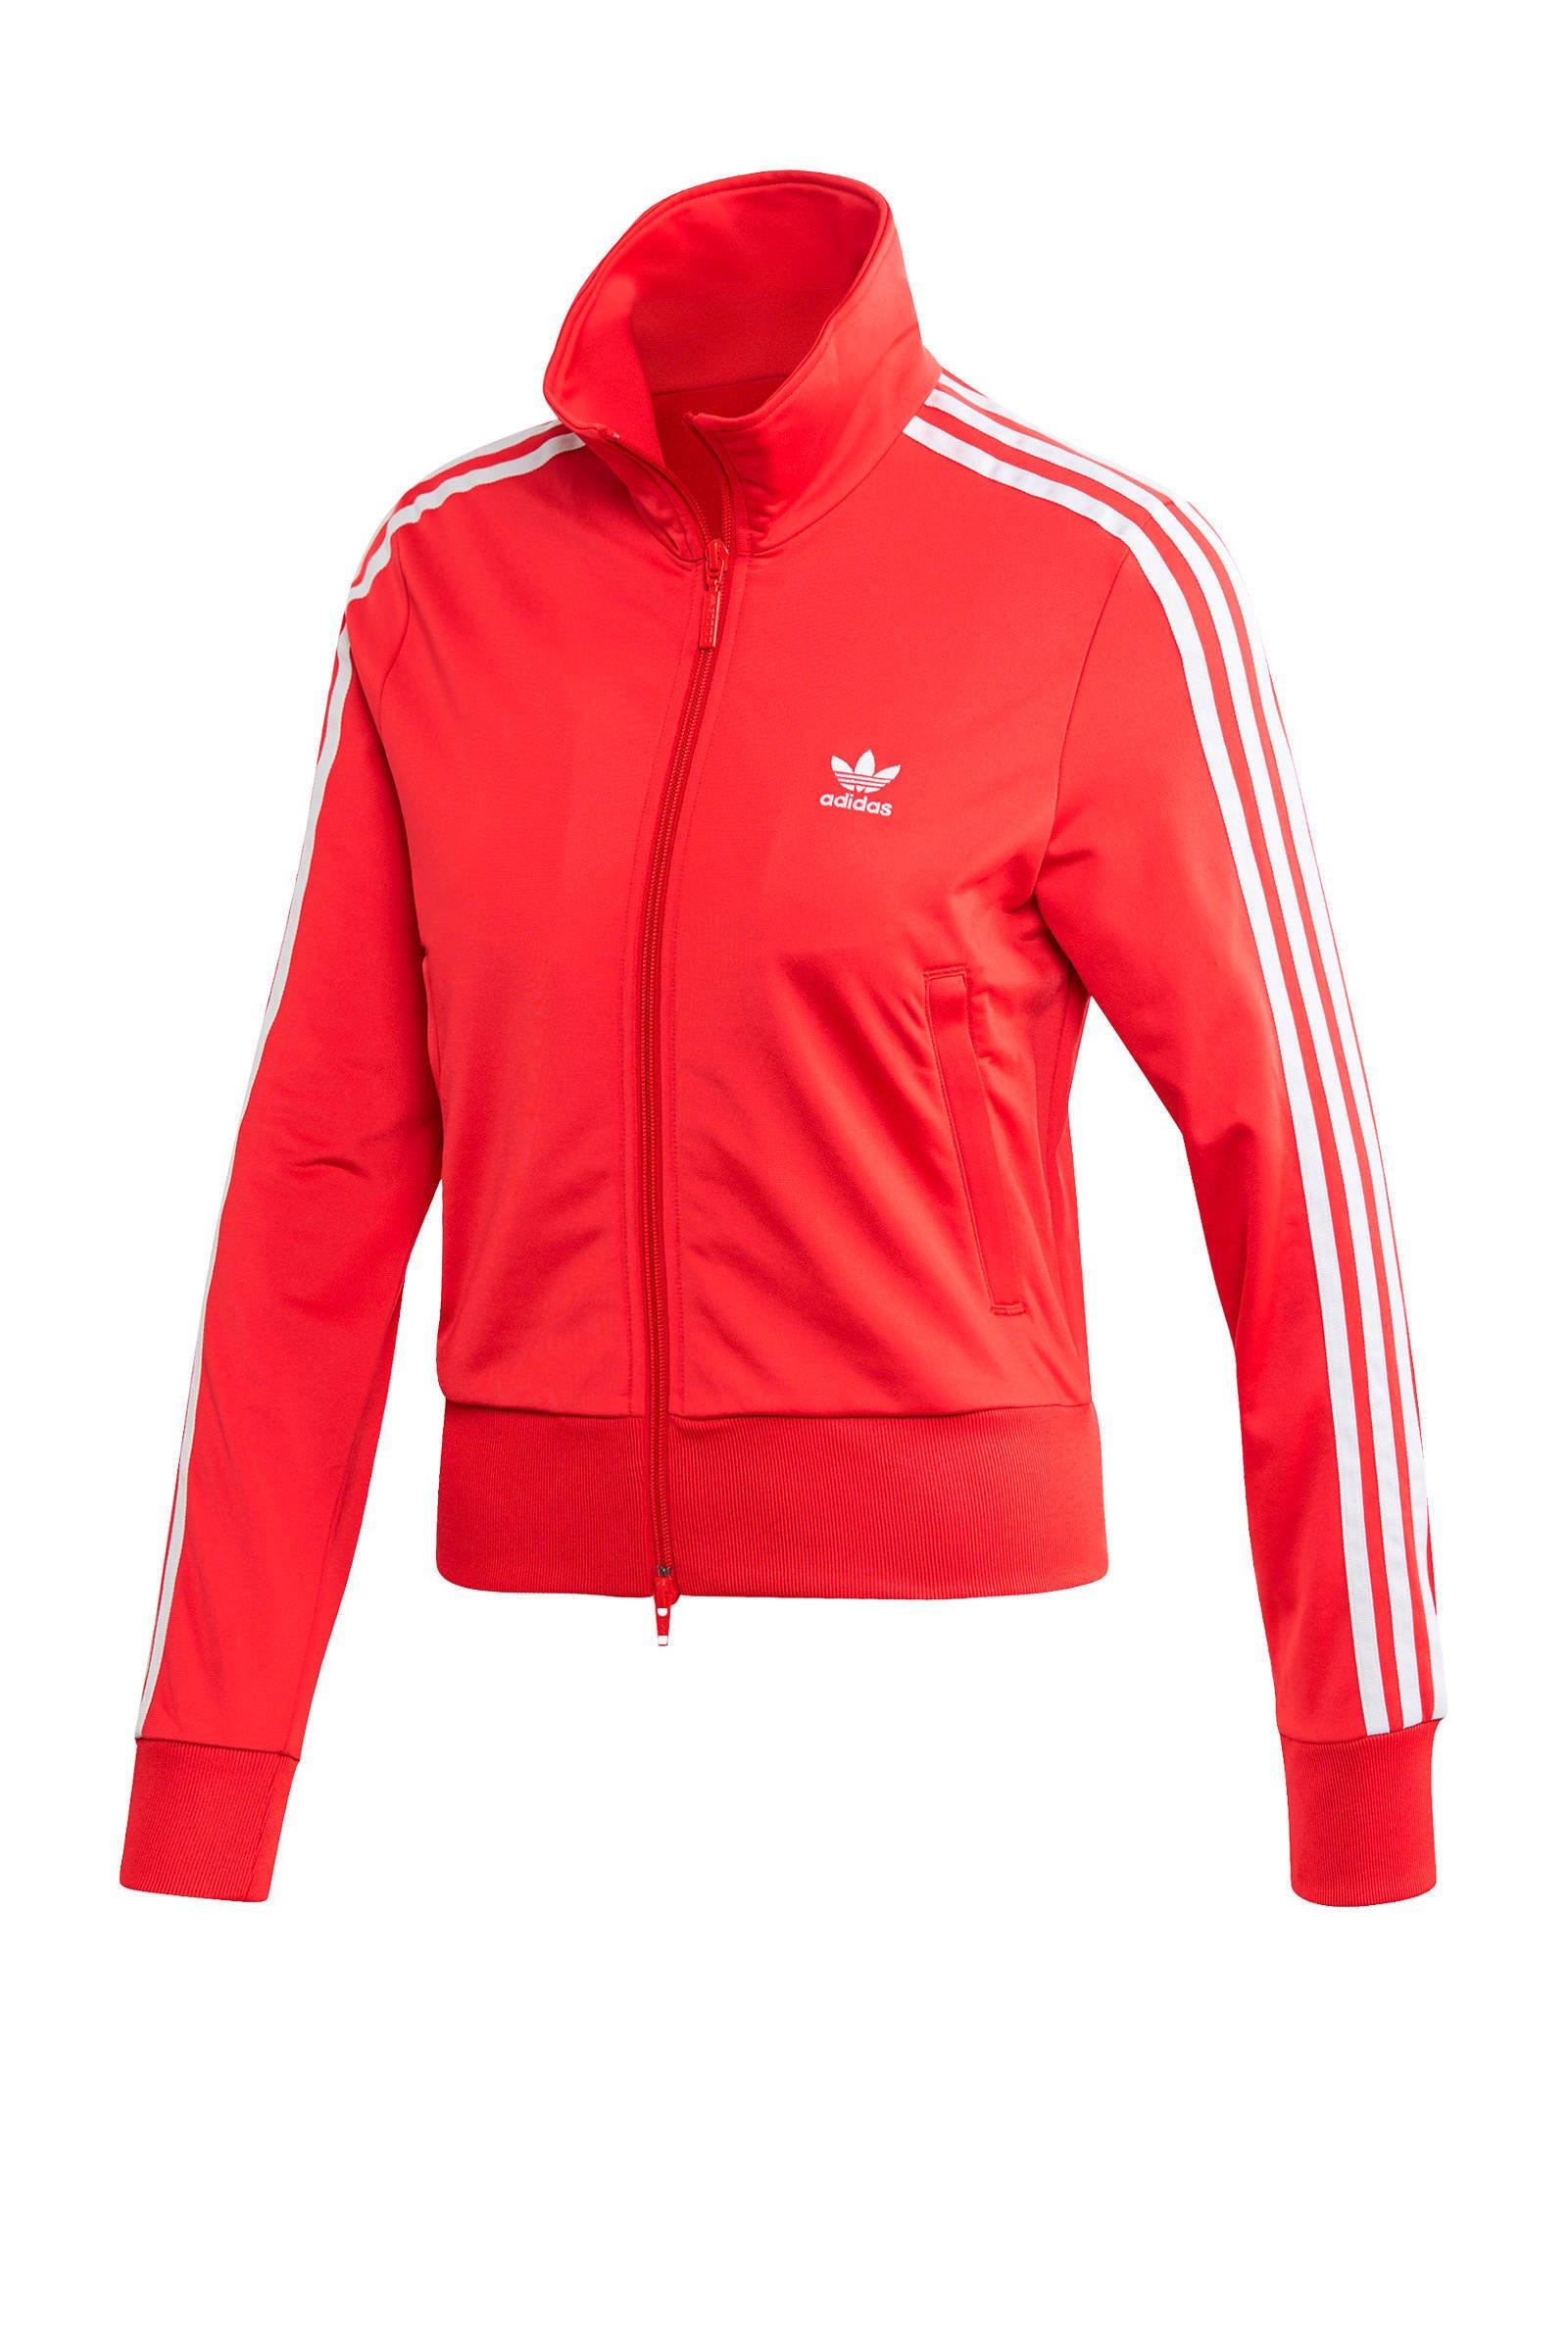 adidas Originals Adicolor vest roodwit | wehkamp